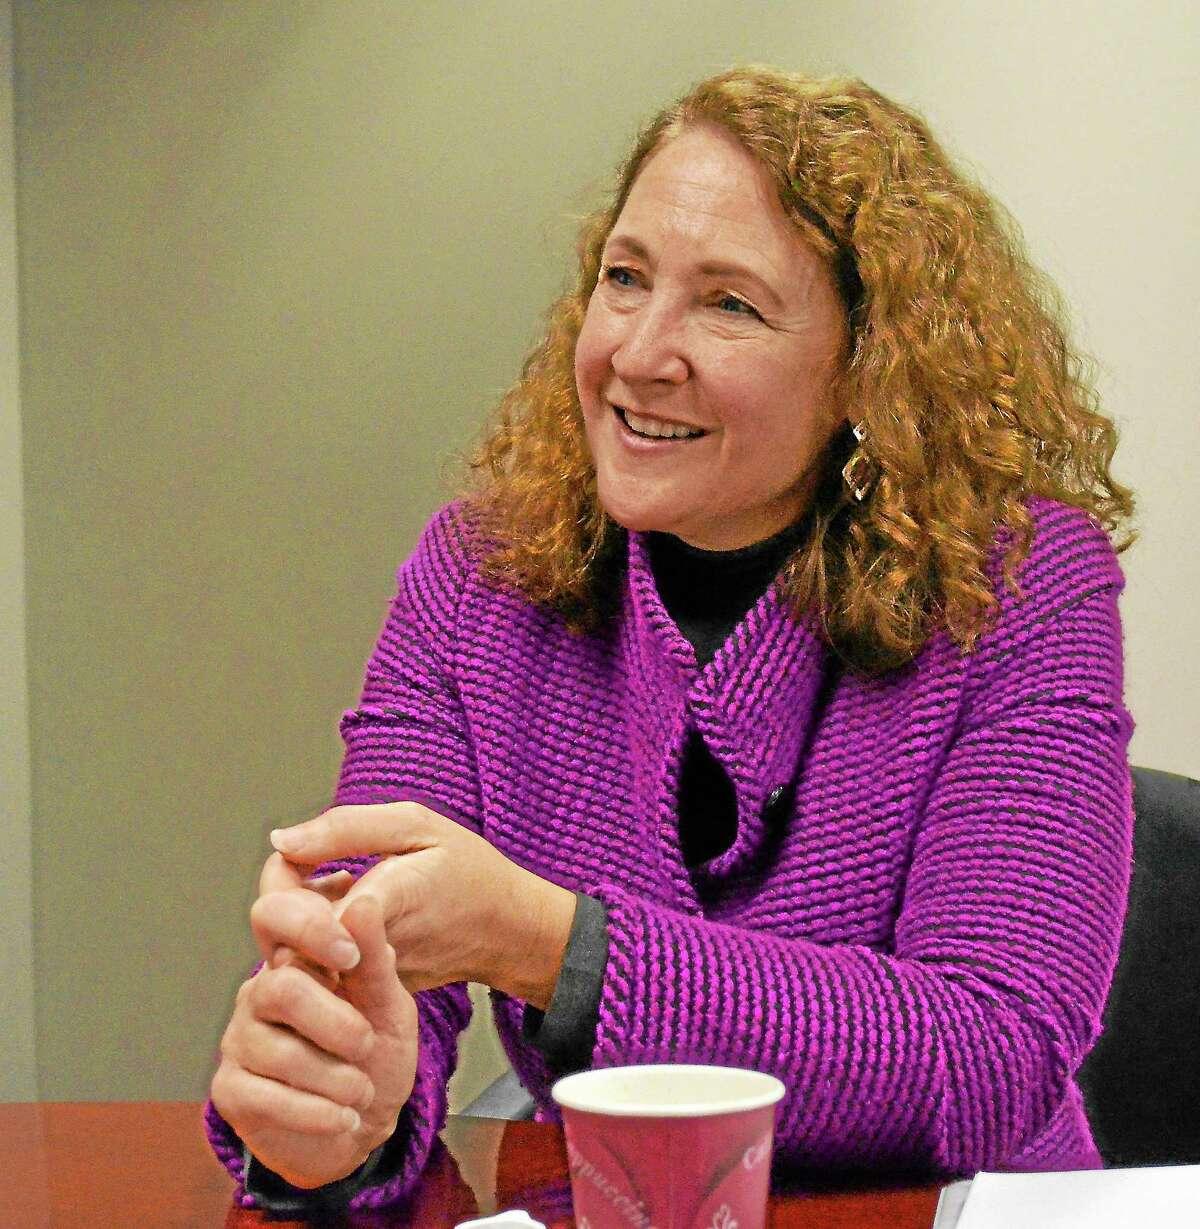 Elisabeth Esty talks with Register Citizen editors, Dec. 5.